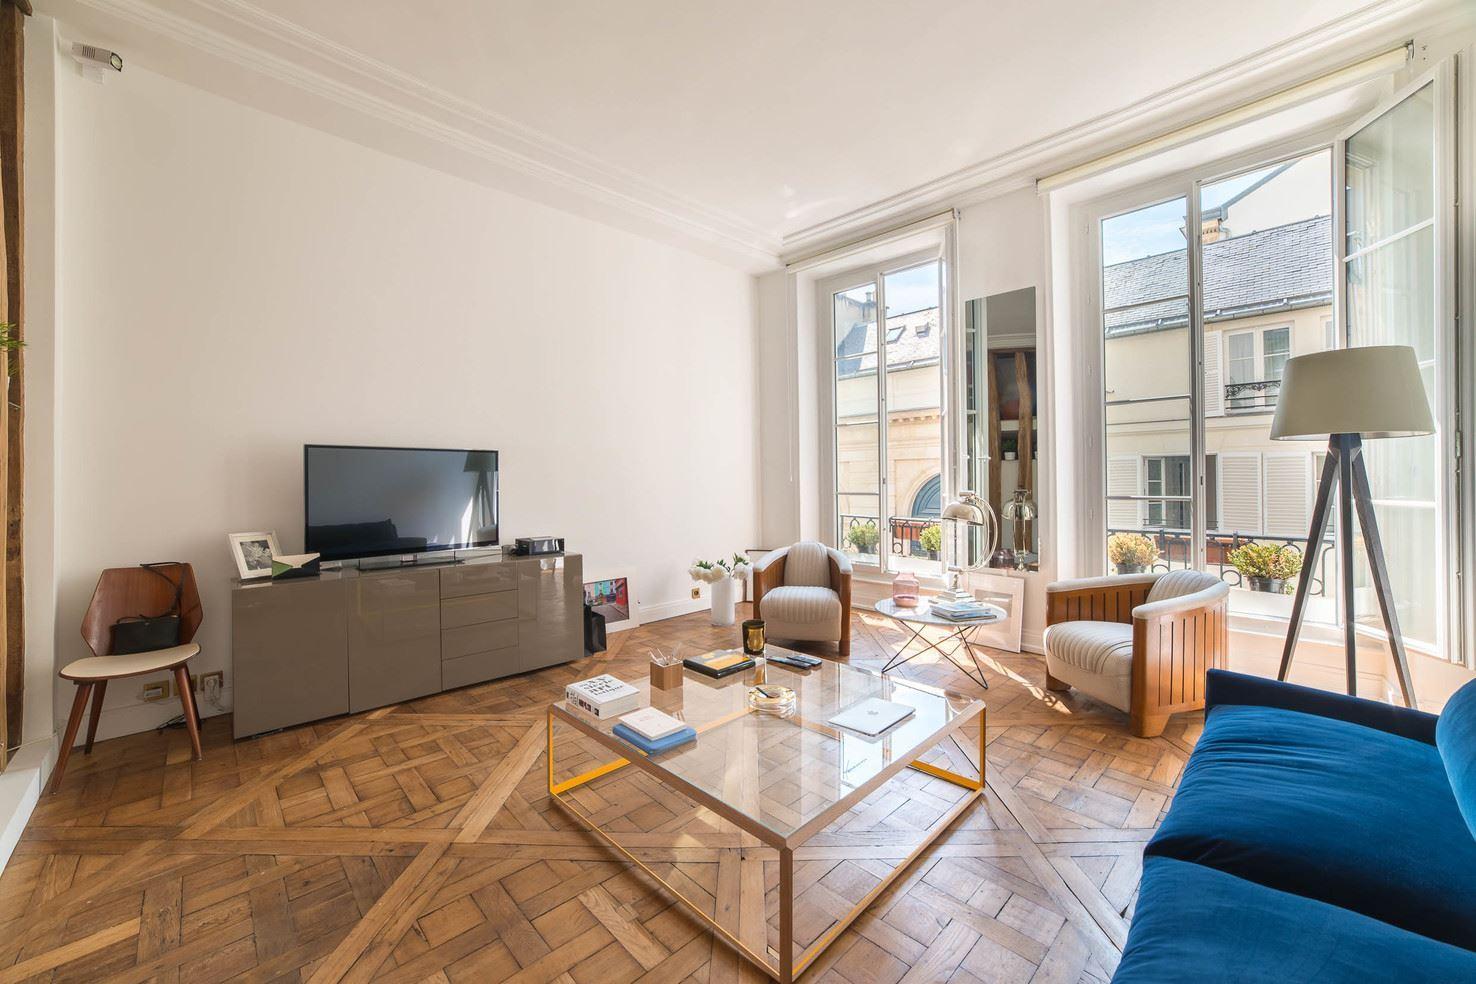 Apartamento por un Venta en Renovated apartment - Rue de Bourgogne Paris 7 Paris, Paris 75007 Francia